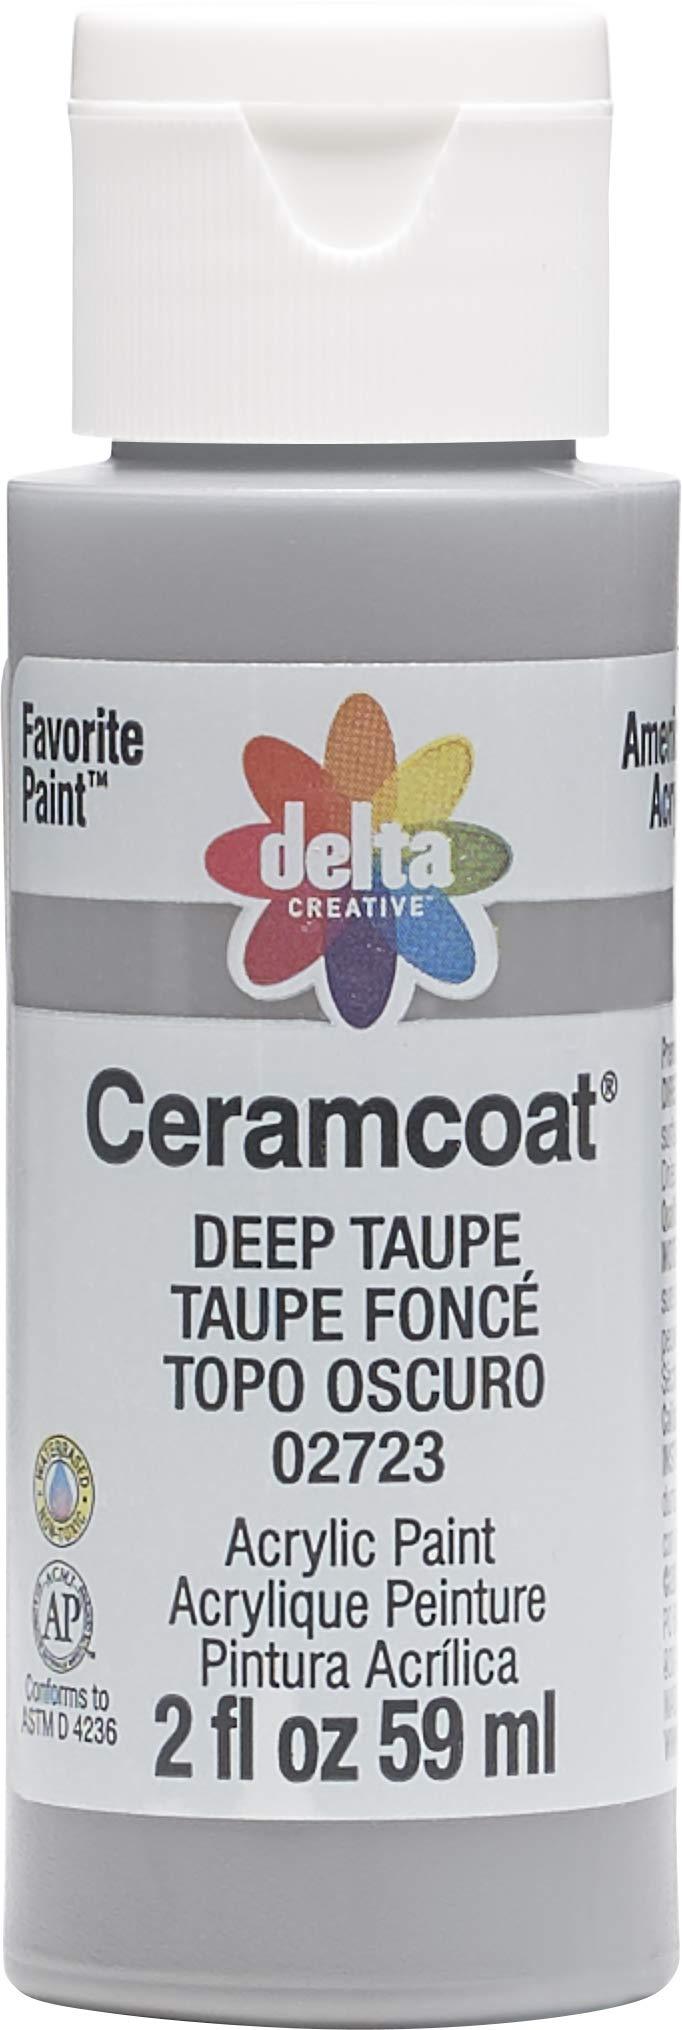 Plaid:Delta 02723 Ceramcoat Acrylic Paint, 2 oz, Deep Taupe